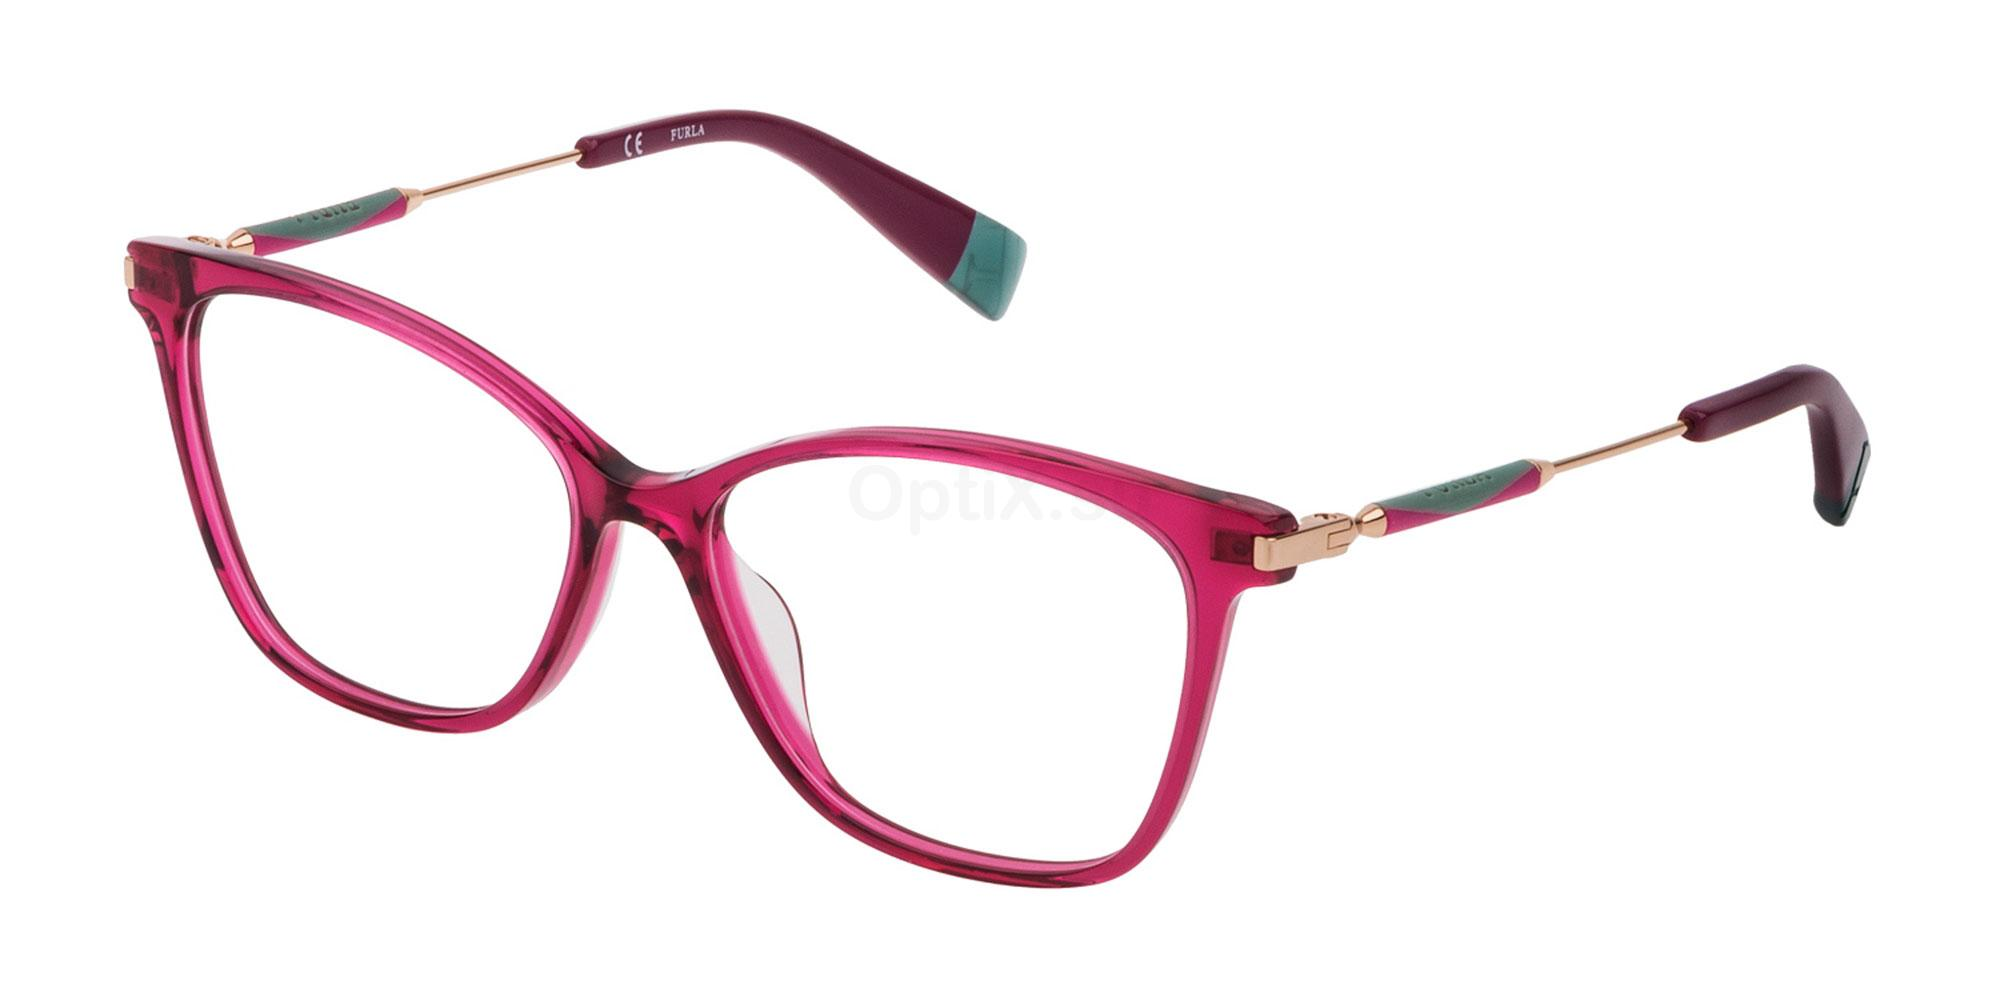 01BV VFU298 Glasses, Furla